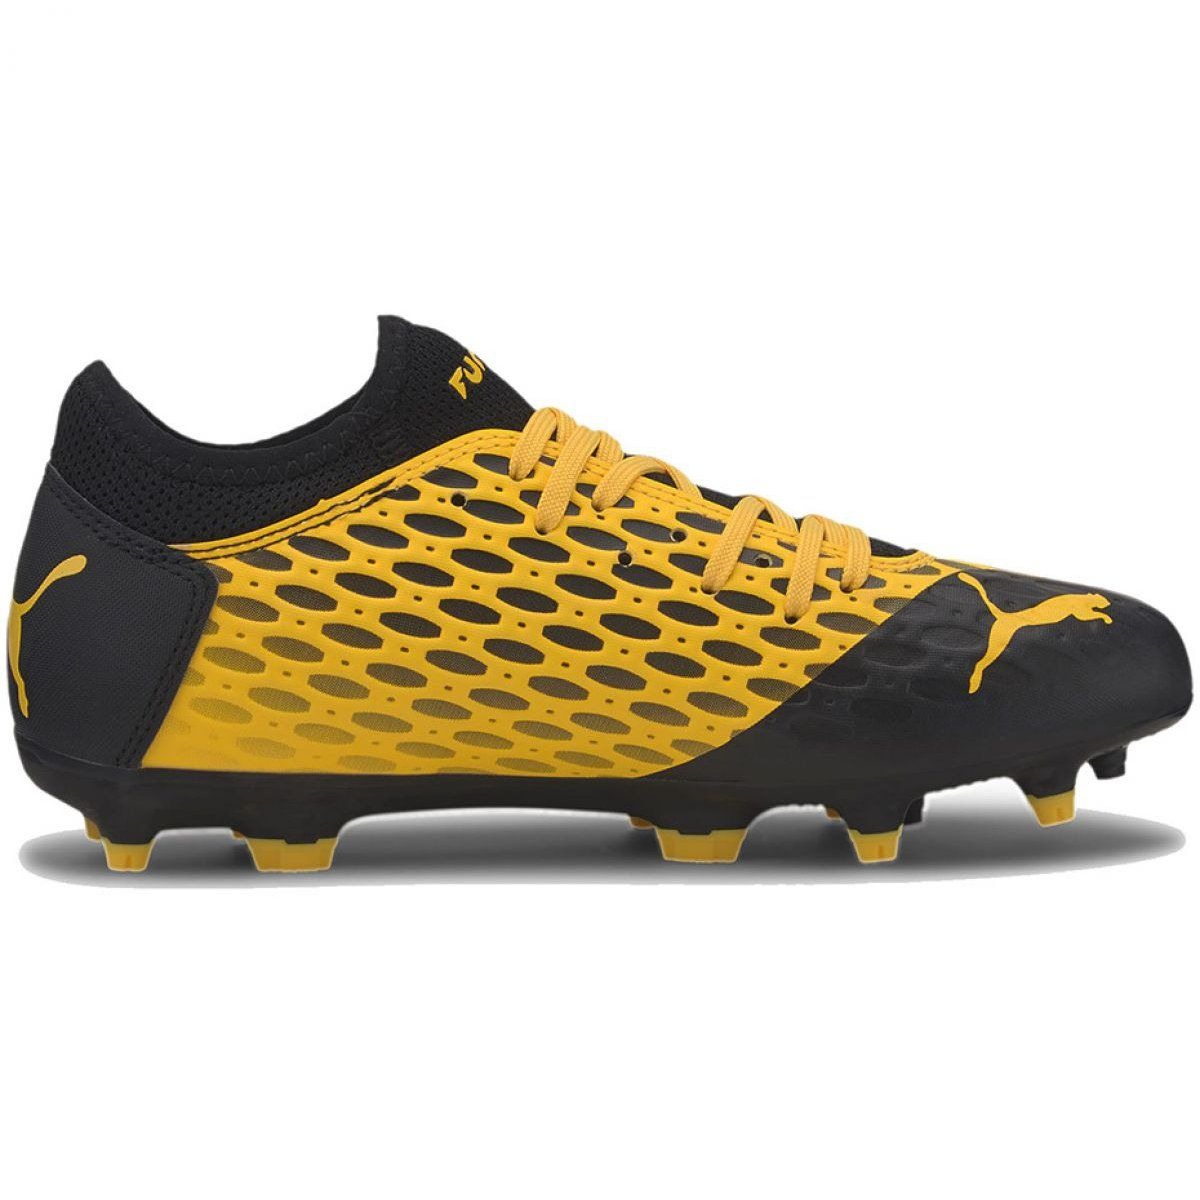 Buty Pilkarskie Puma Future 5 4 Fg Ag Jr 105810 03 Zolte Zolte Puma Sport Shoes Shoes